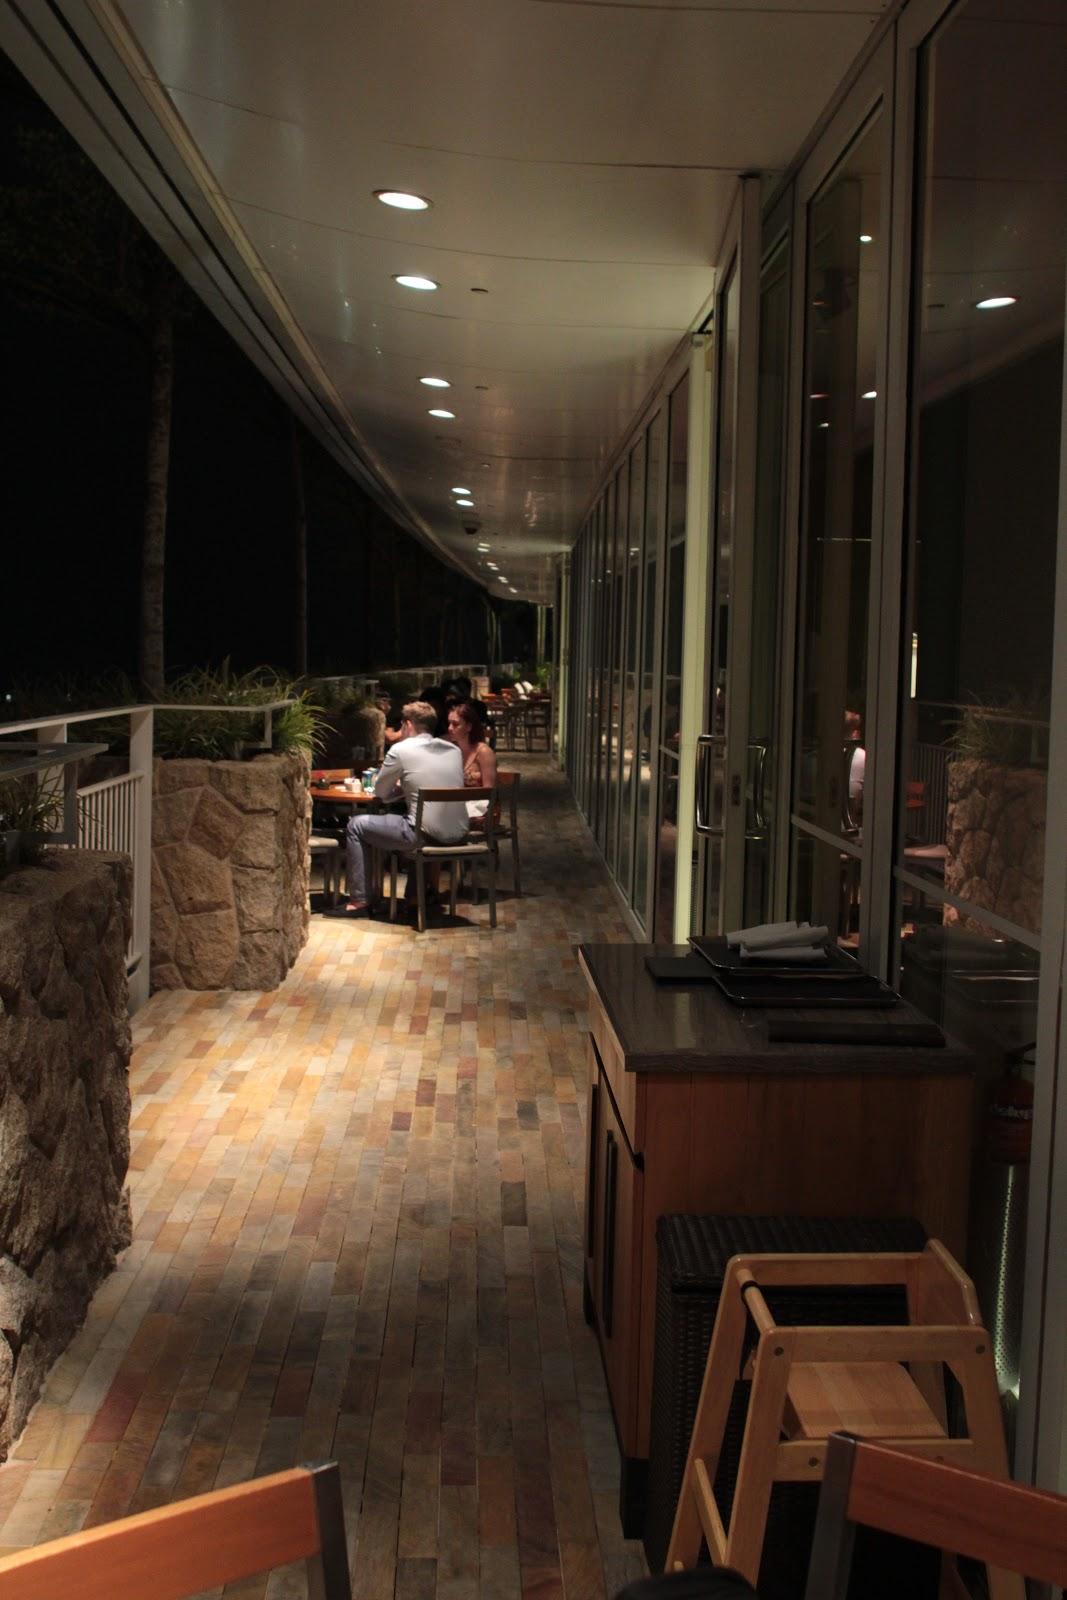 The Chocolate Bar @The Club, Marina Bay Sands Hotel